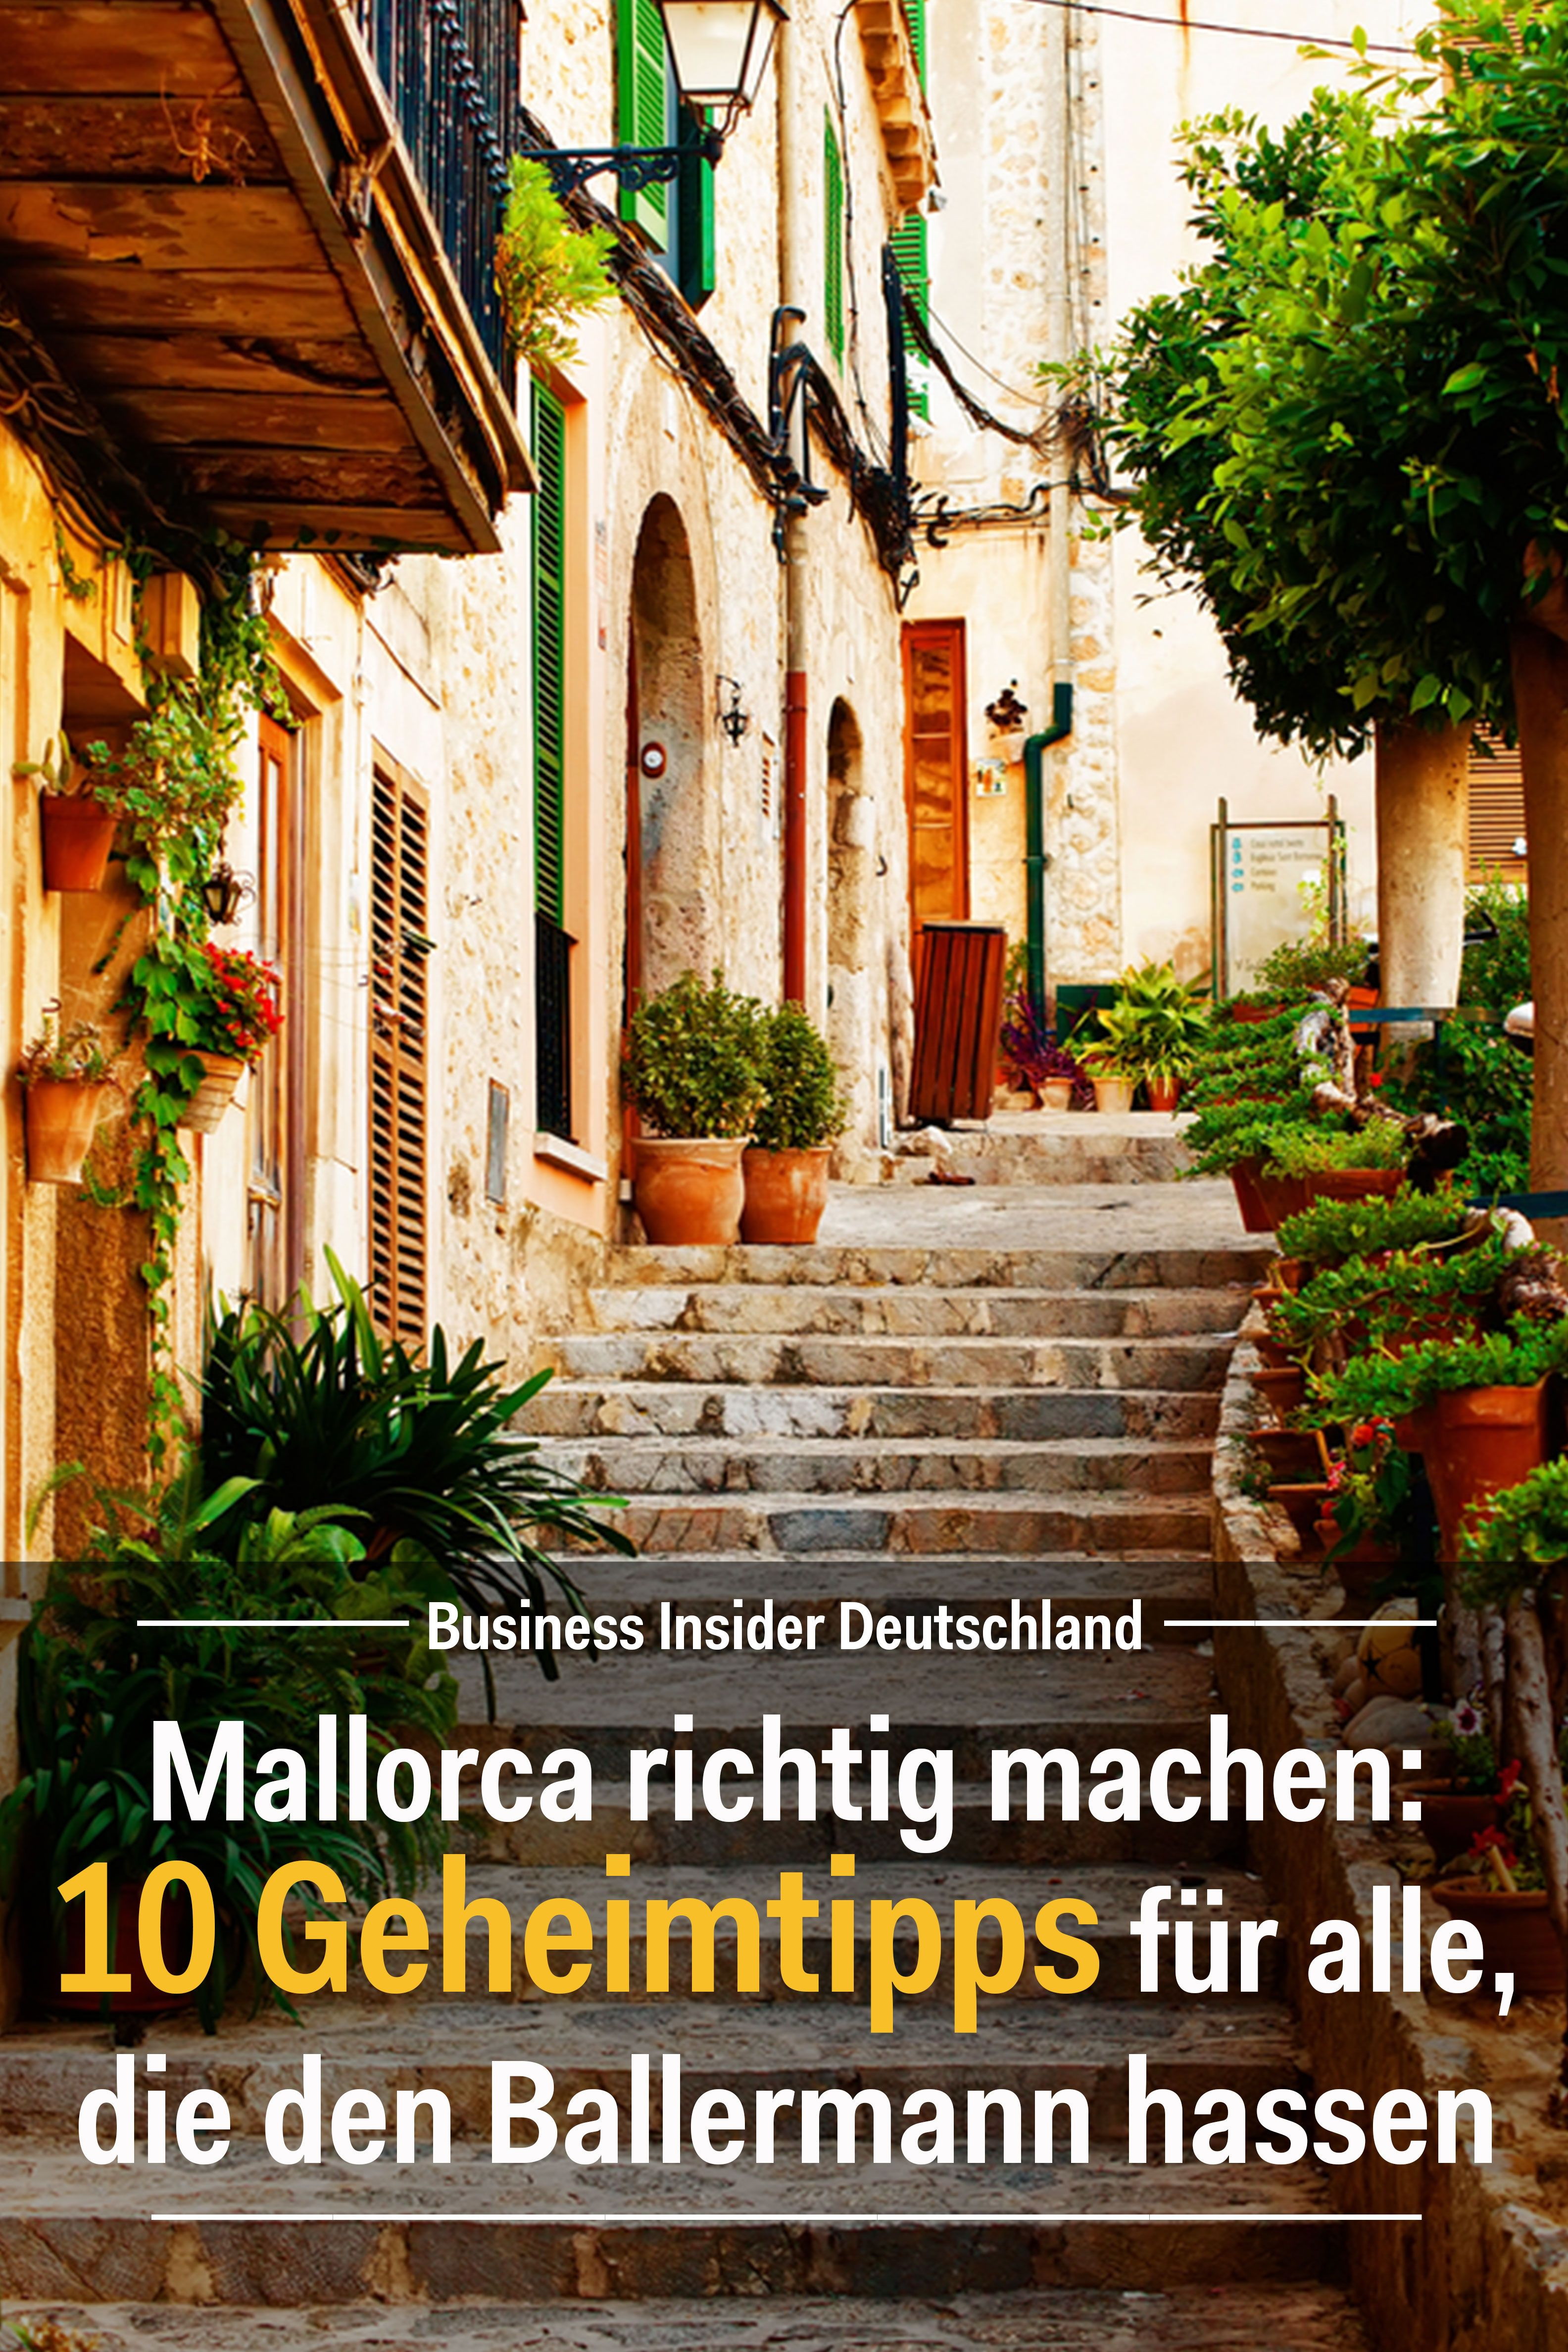 Hacer Mallorca bien: 10 consejos internos para todos los que odian a Ballermann